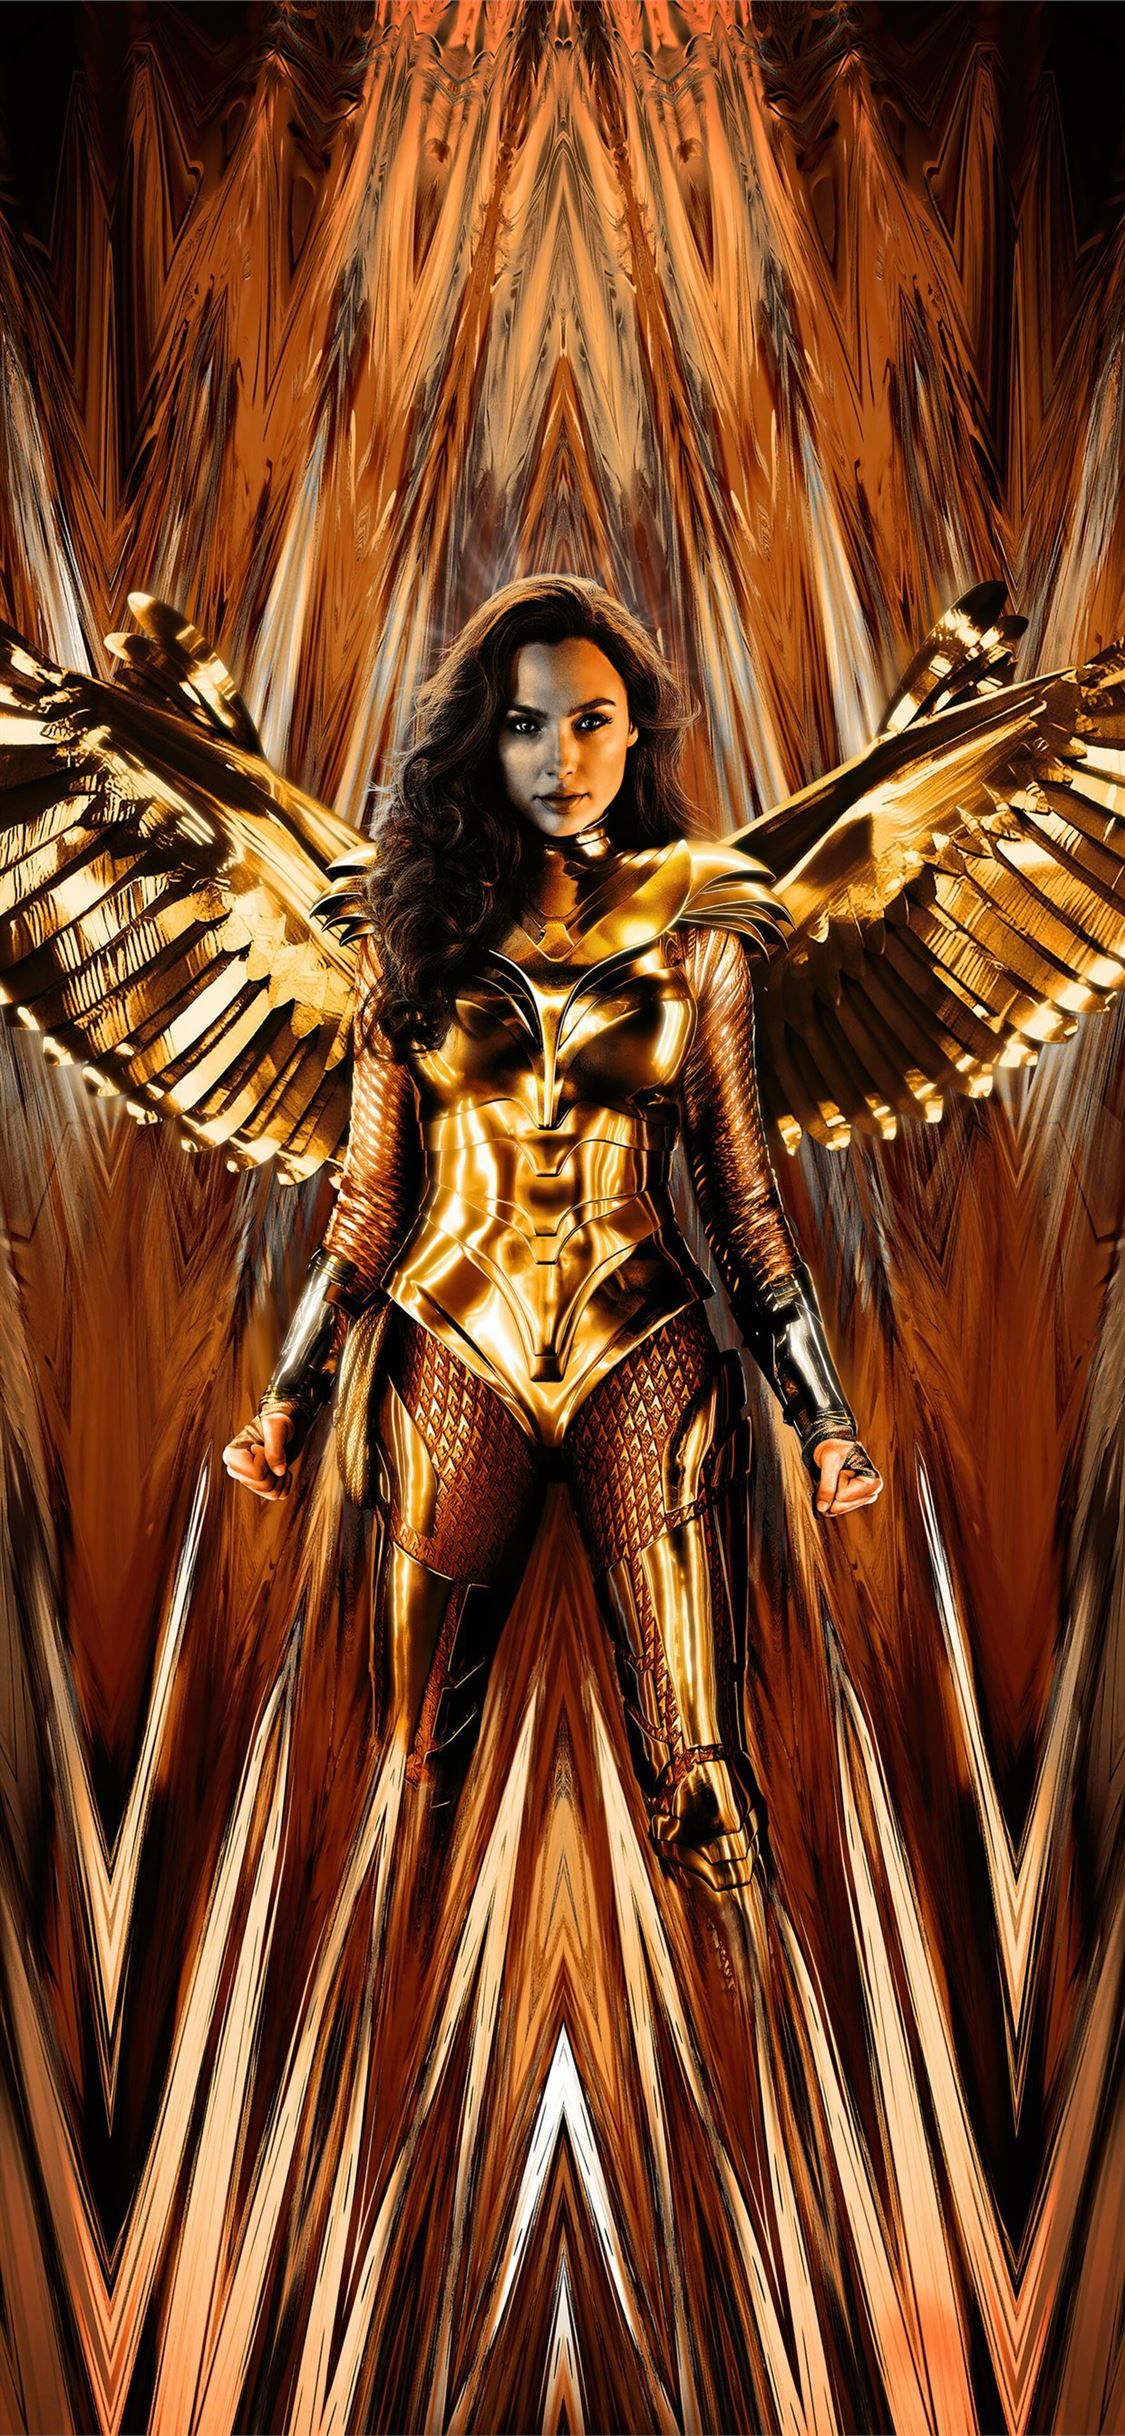 2020 Wonder Woman 1984 4k Wonderwoman1984 Wonderwoman2 Wonderwoman Movies 2020movies Galgadot 4k Ip In 2020 Wonder Woman Art Wonder Woman Pictures Wonder Woman